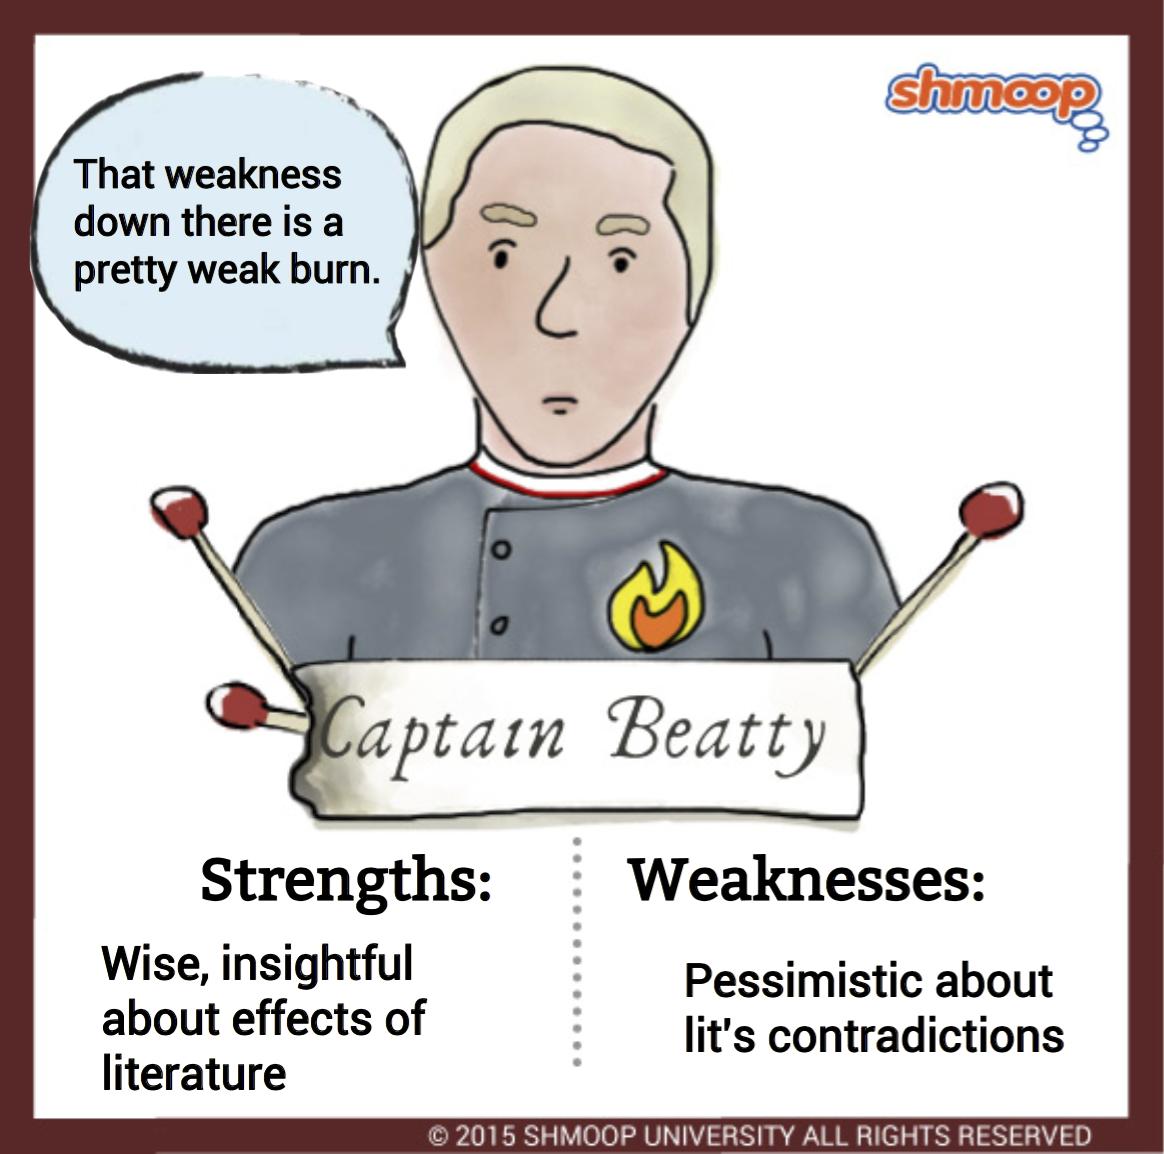 Quotes From Fahrenheit 451: Captain Beatty In Fahrenheit 451